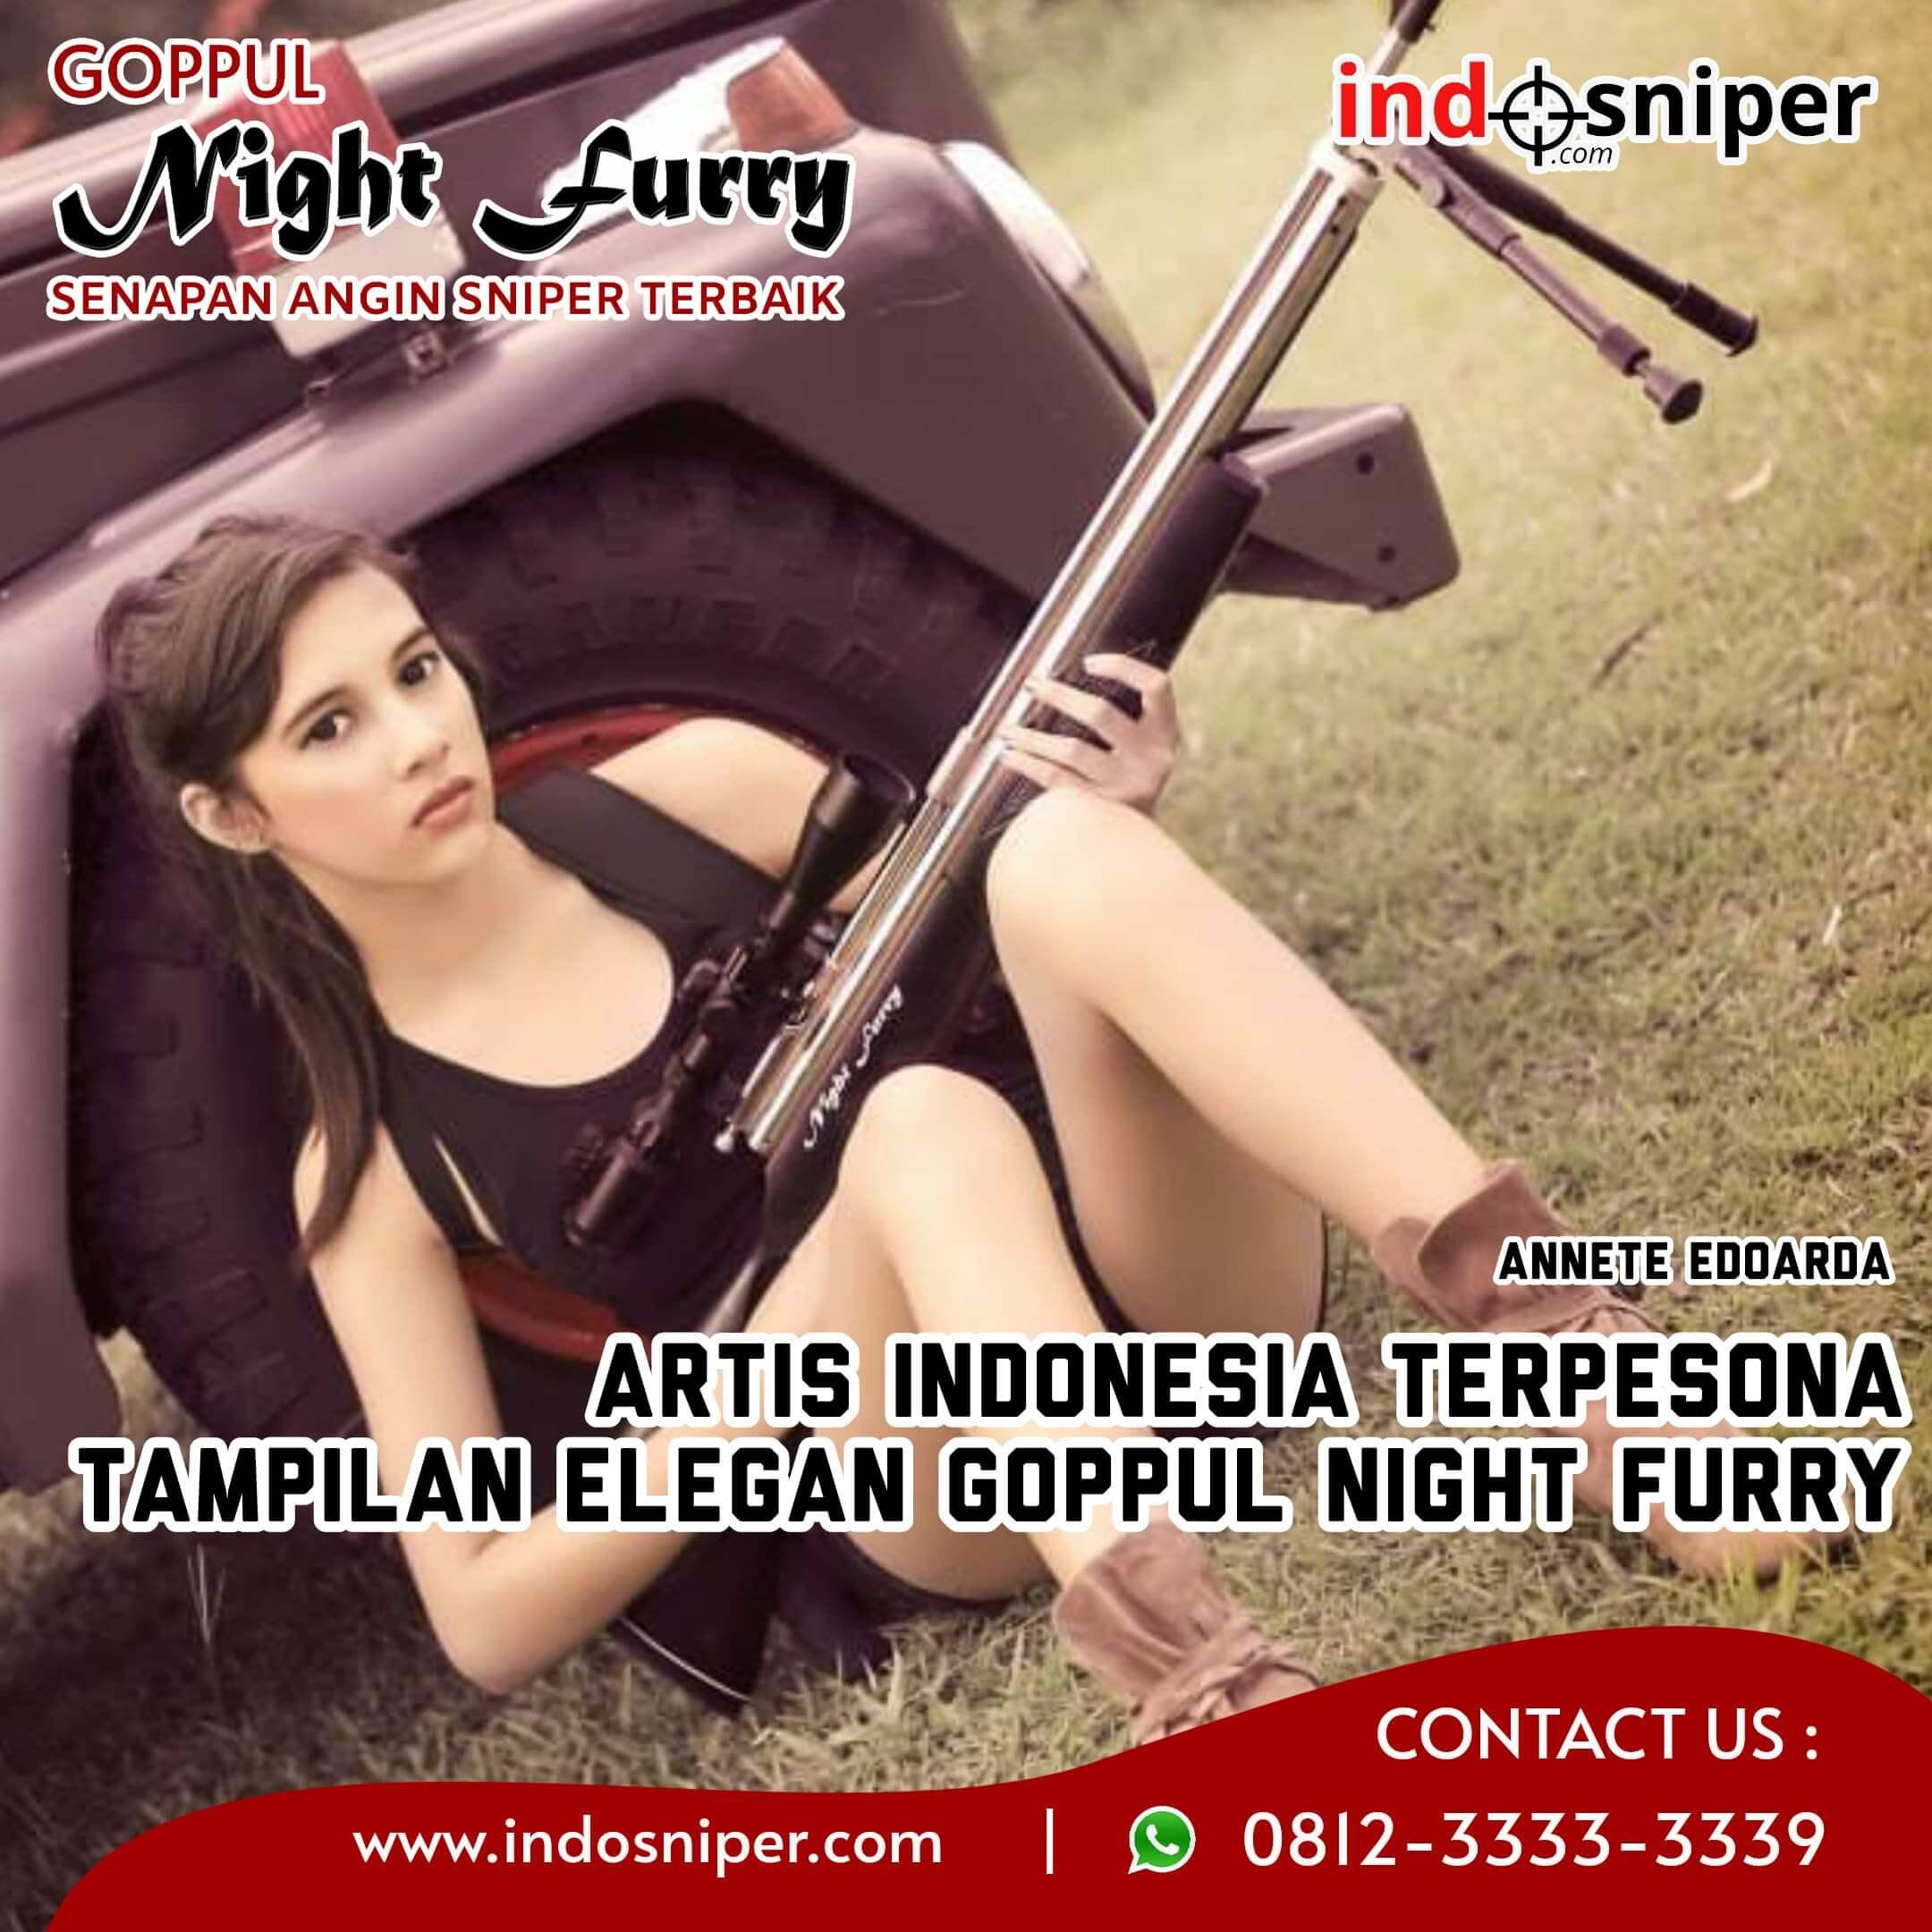 Artis Indonesia Terpesona Tampilan Elegan Goppul Night Furry